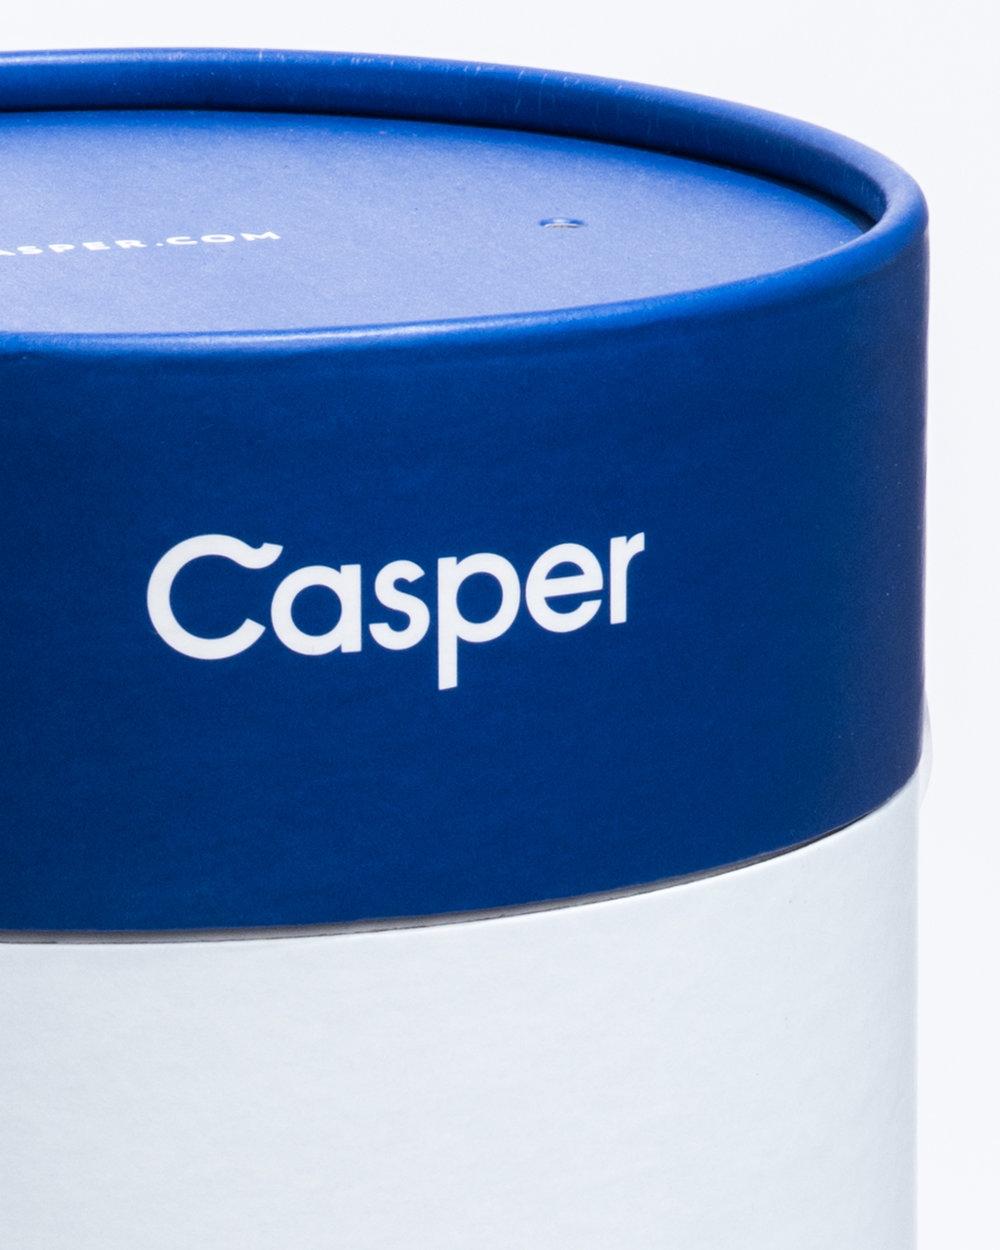 Casper Pillow-2.JPG